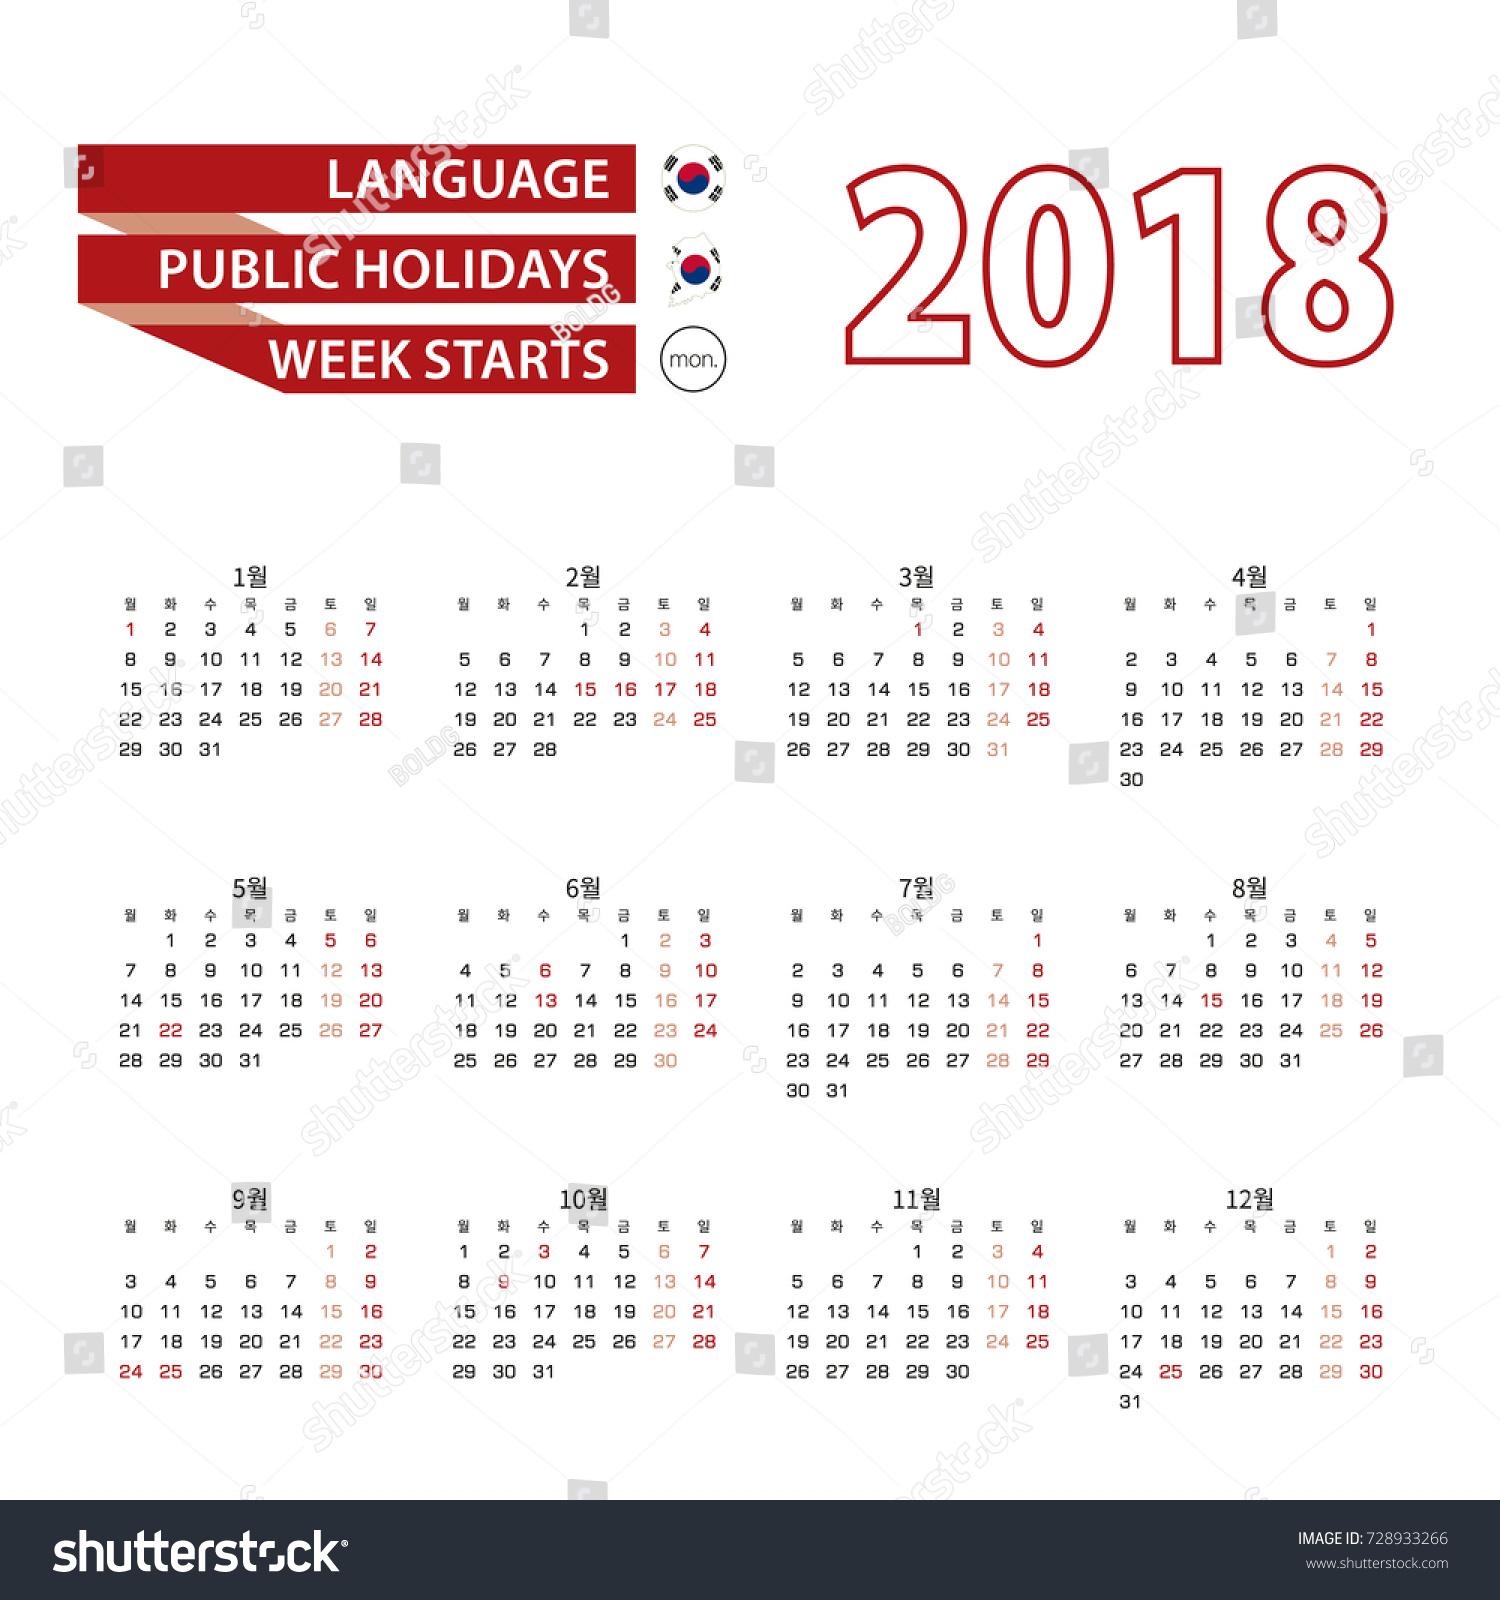 Calendar 2018 Korean Language Public Holidays Stock Vector (2018